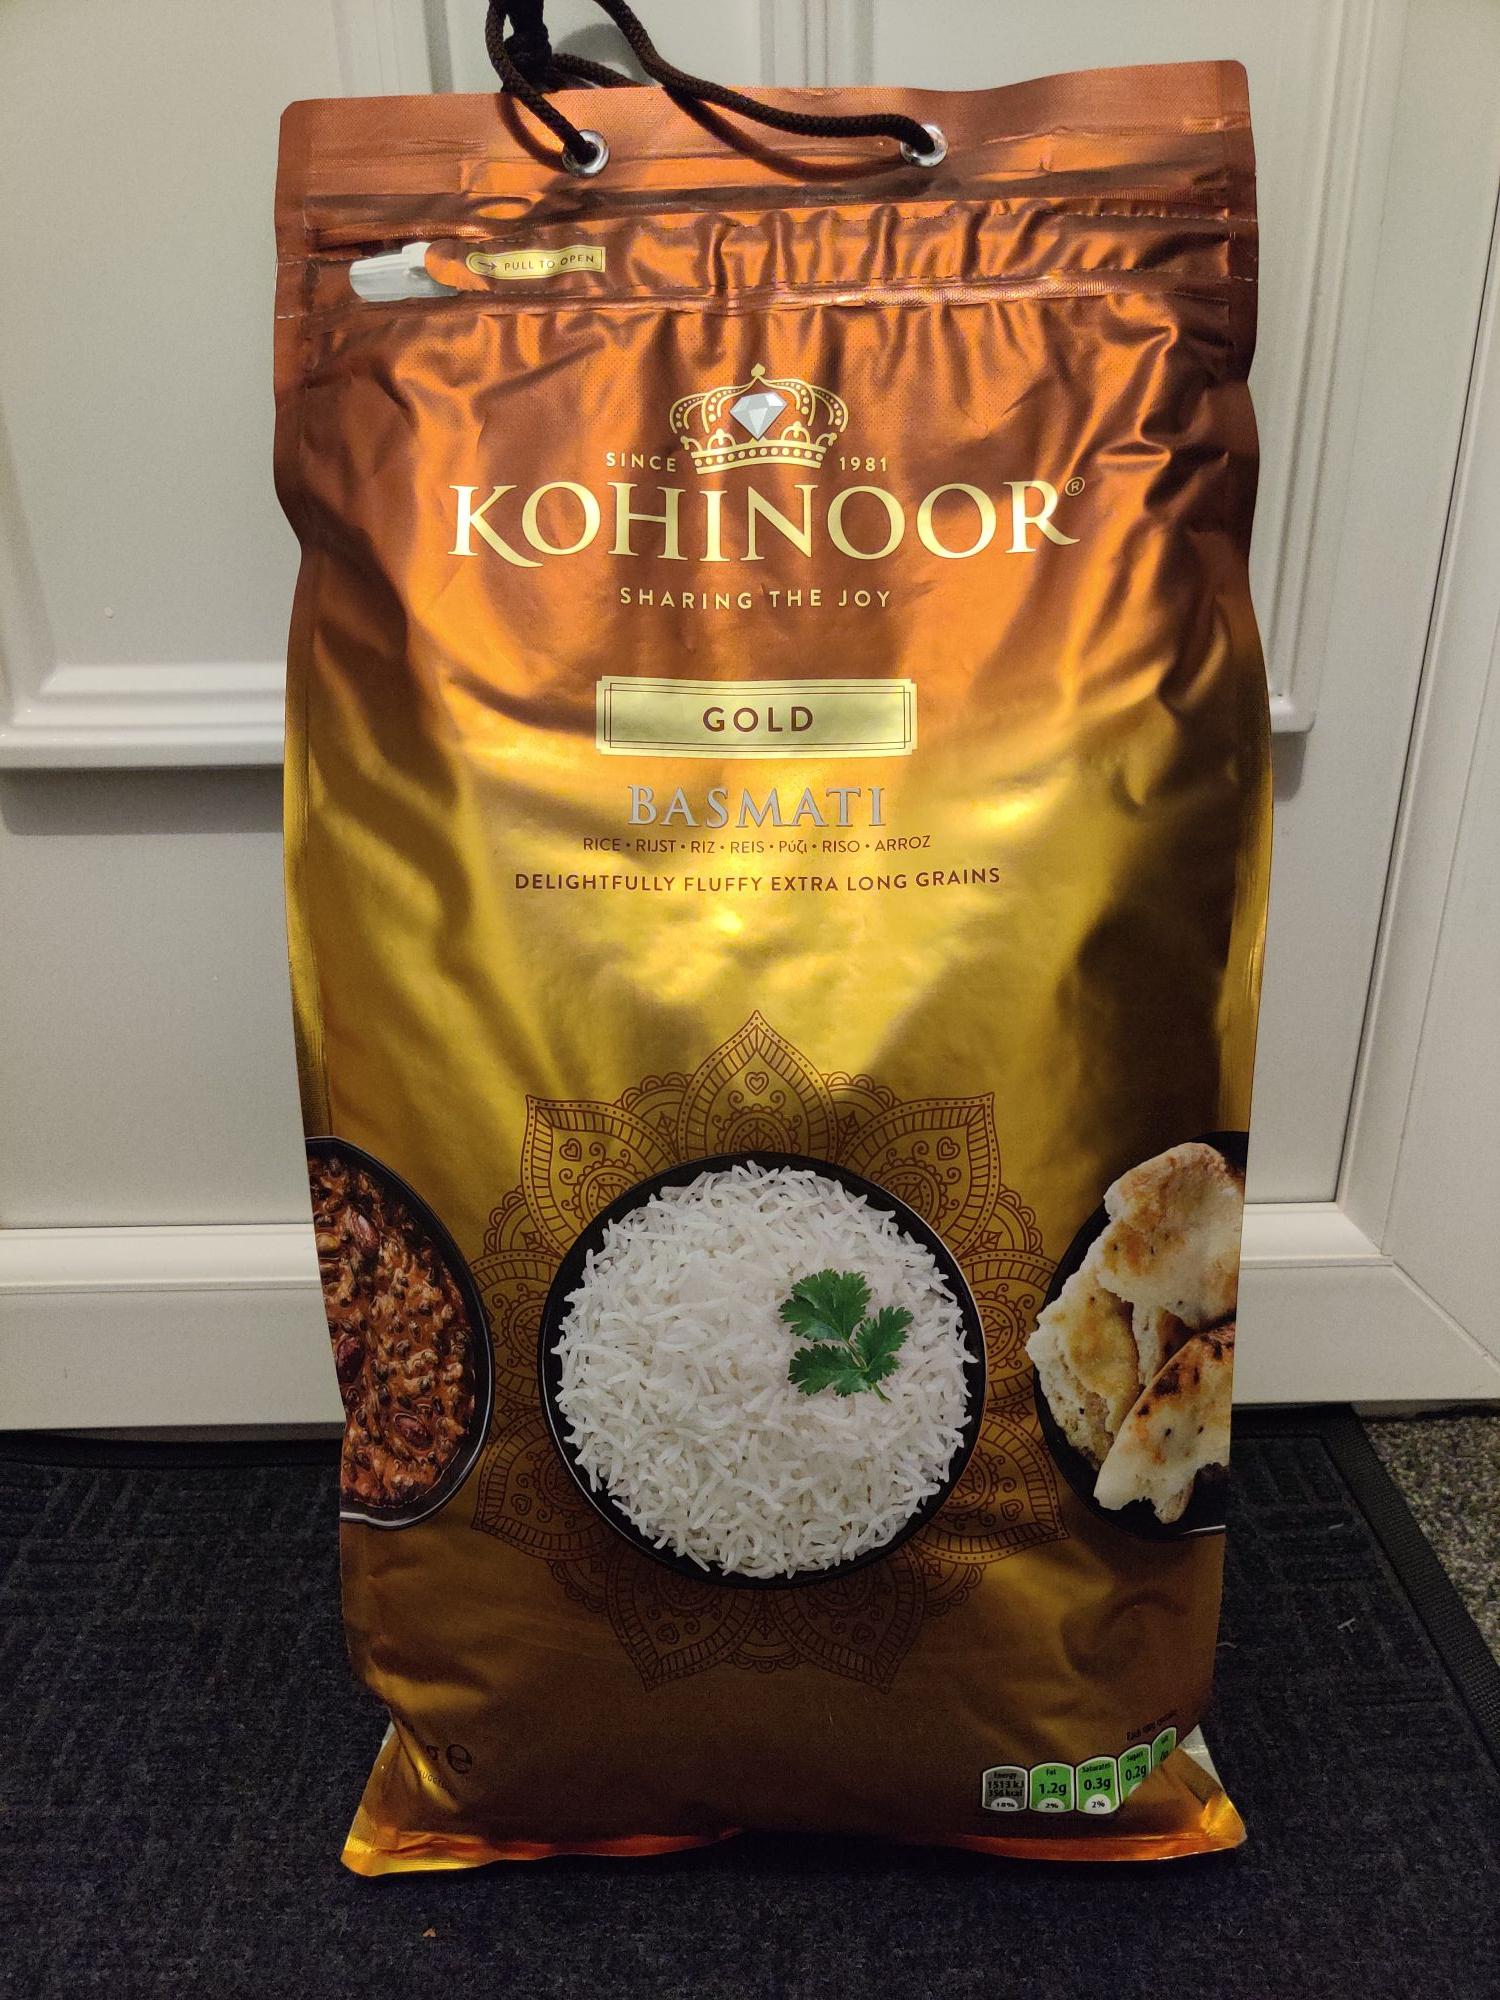 Kohinoor Gold Basmati Rice £12.50 @ Asda